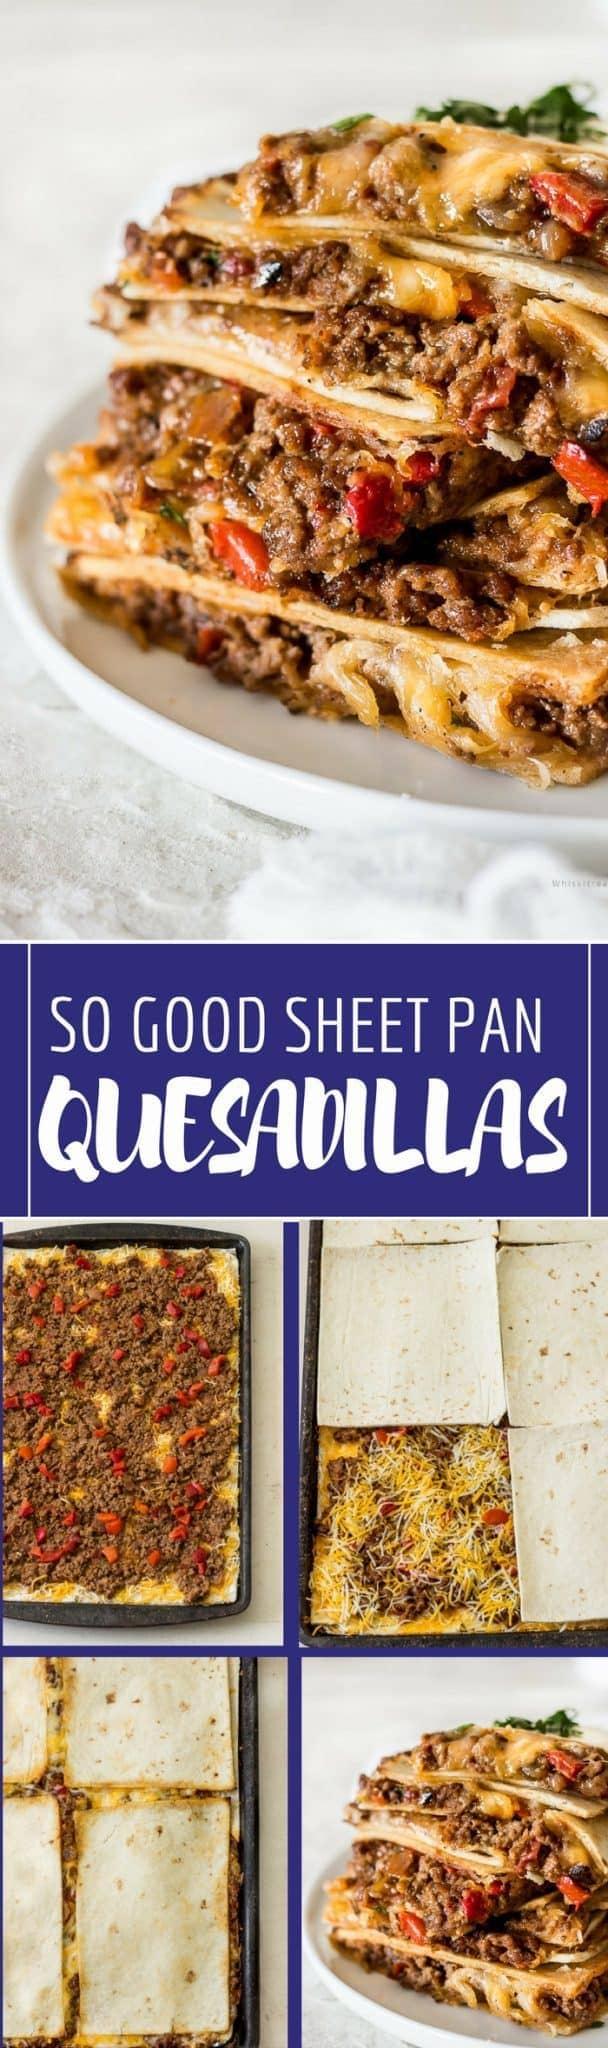 Quesadillas (Sheet Pan Quesadilla recipe)